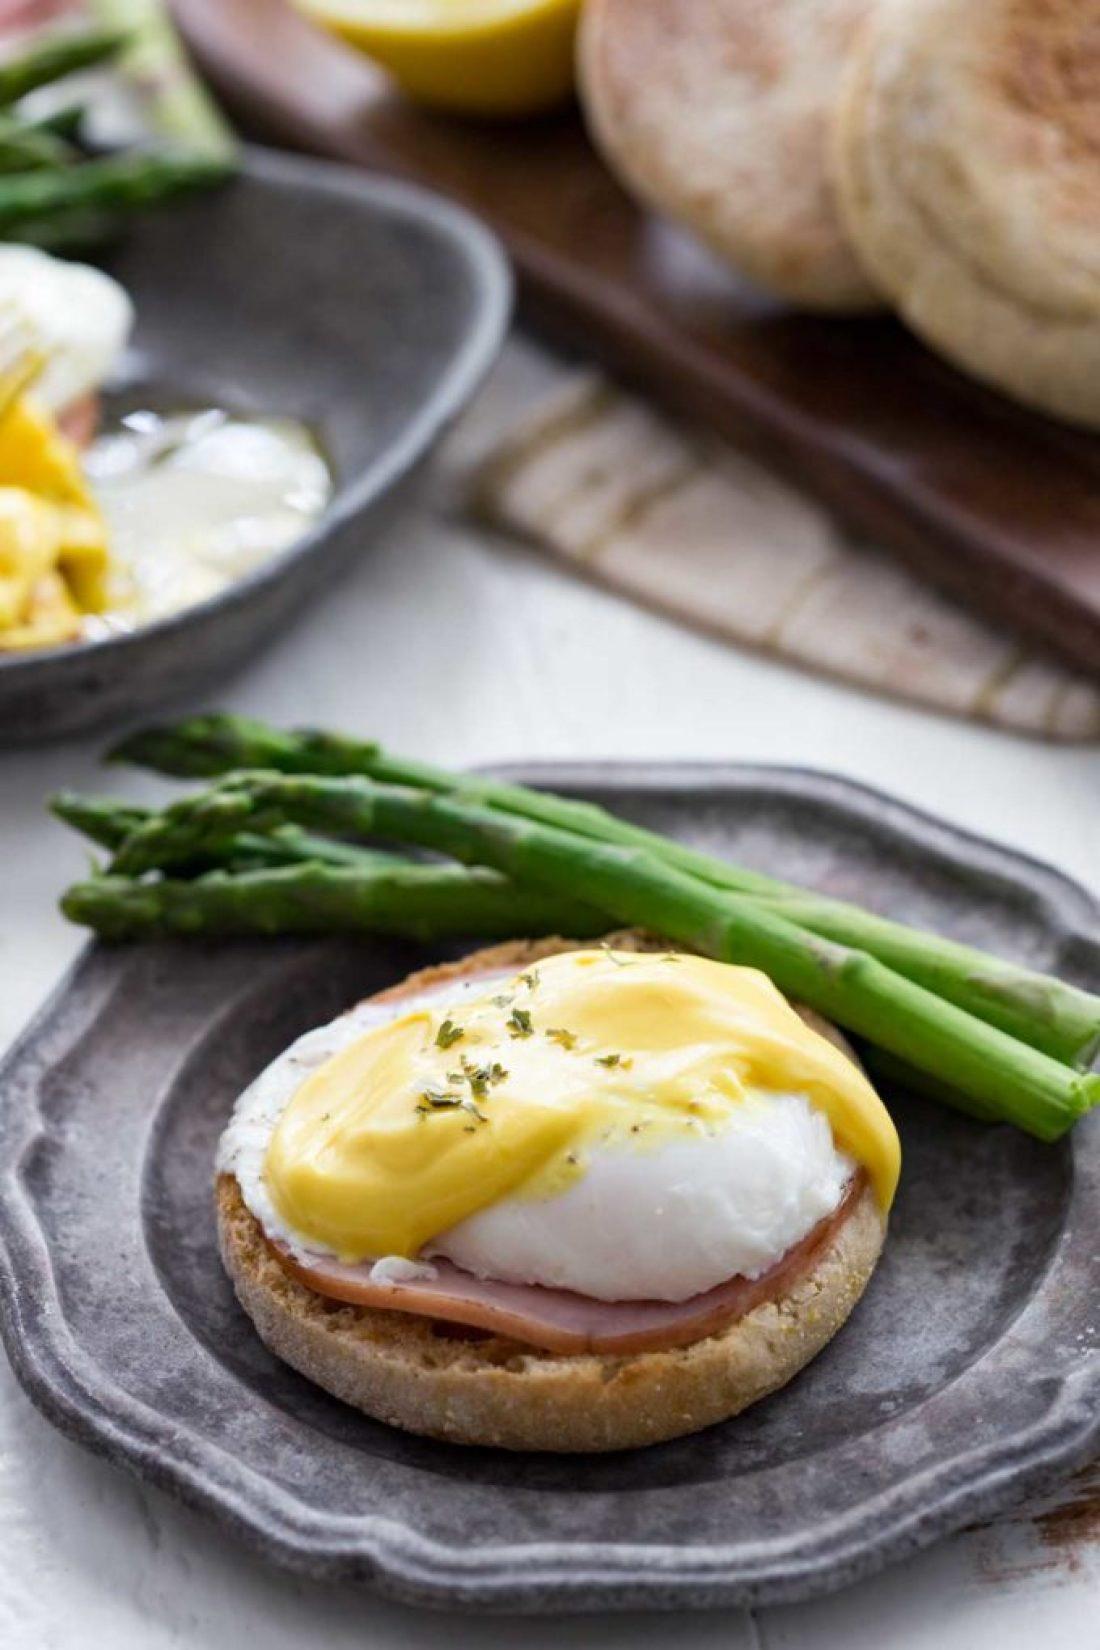 eggs benedict, eggs and breakfast meat, a healthy breakfast